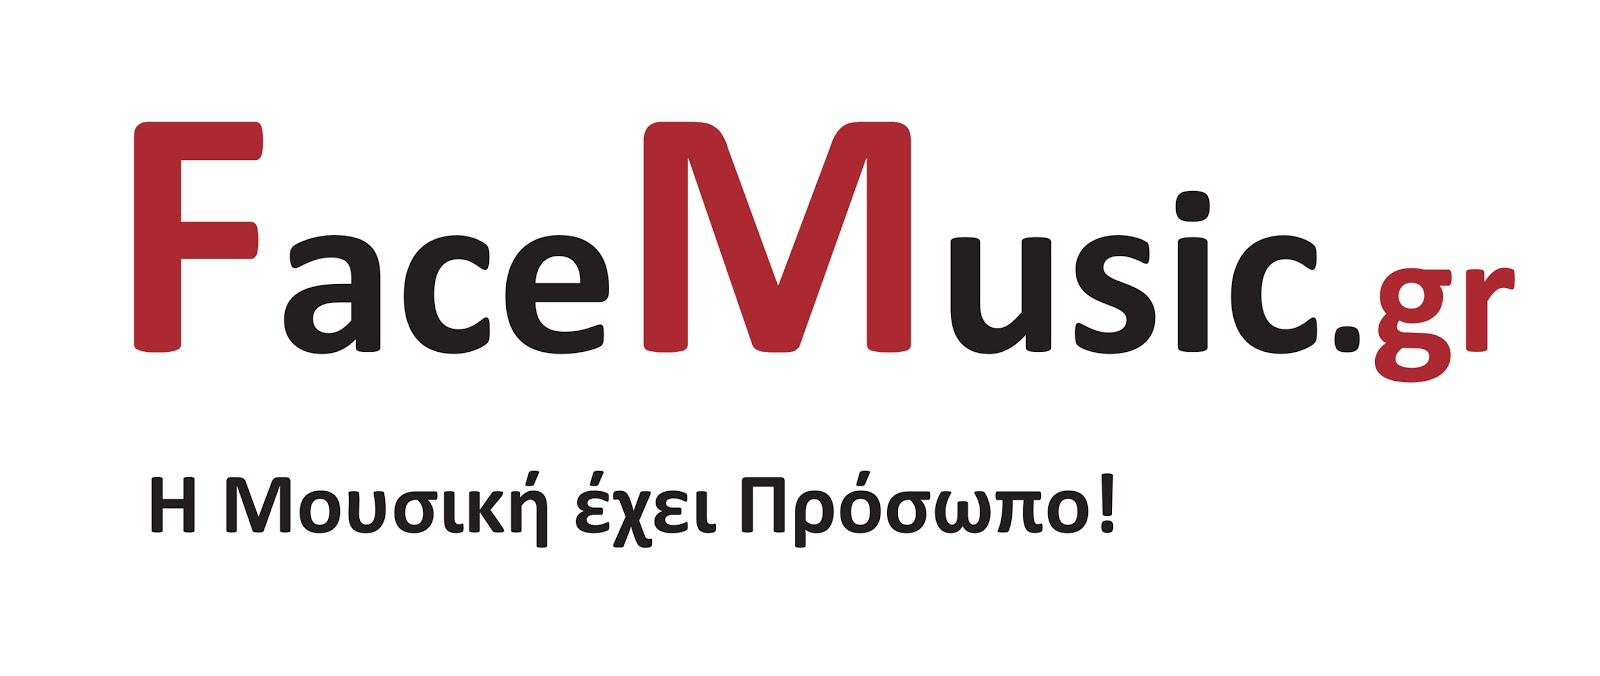 FaceMusic.gr Η Μουσική έχει Πρόσωπο!